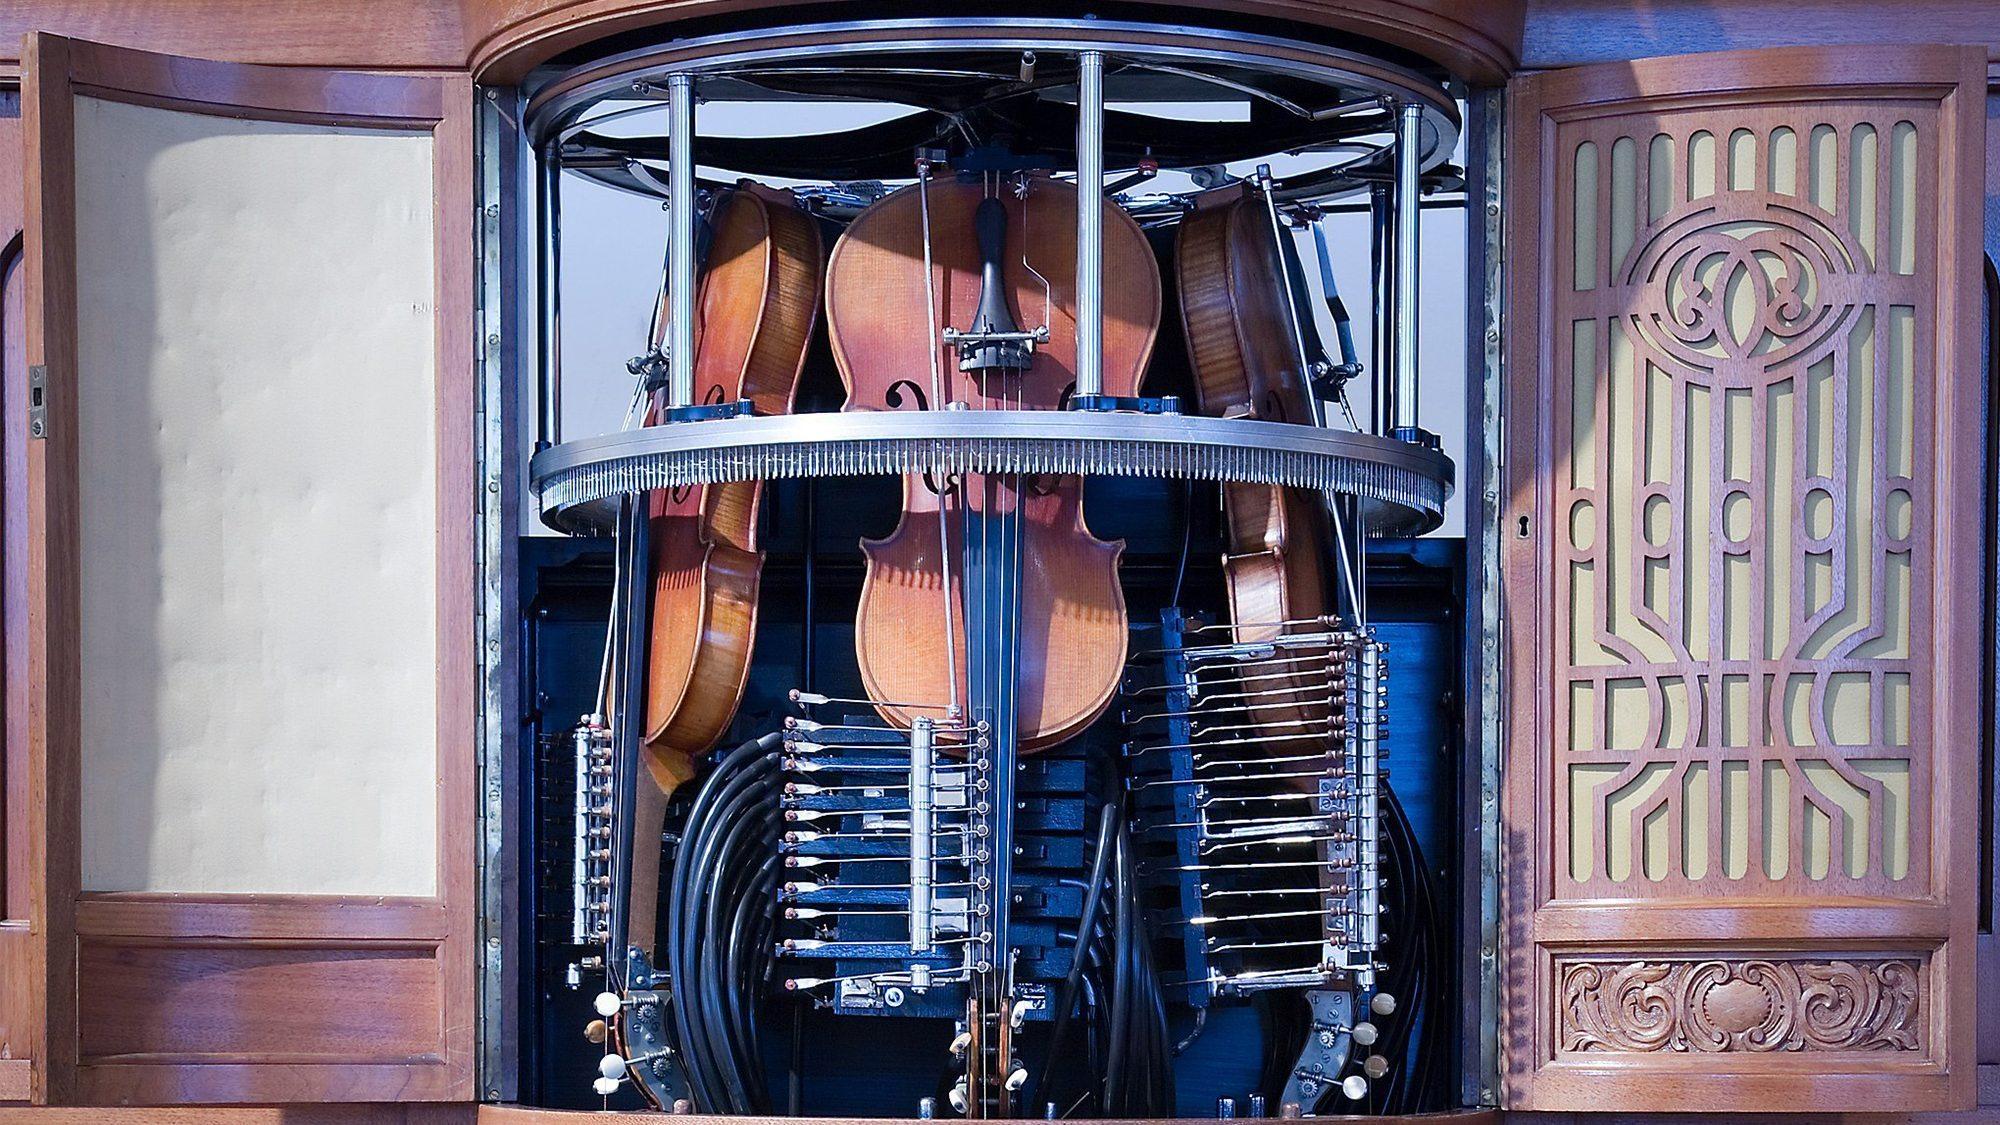 Image: the Hupfeld Phonoliszt Violina, the 100-year-old self-playing violin